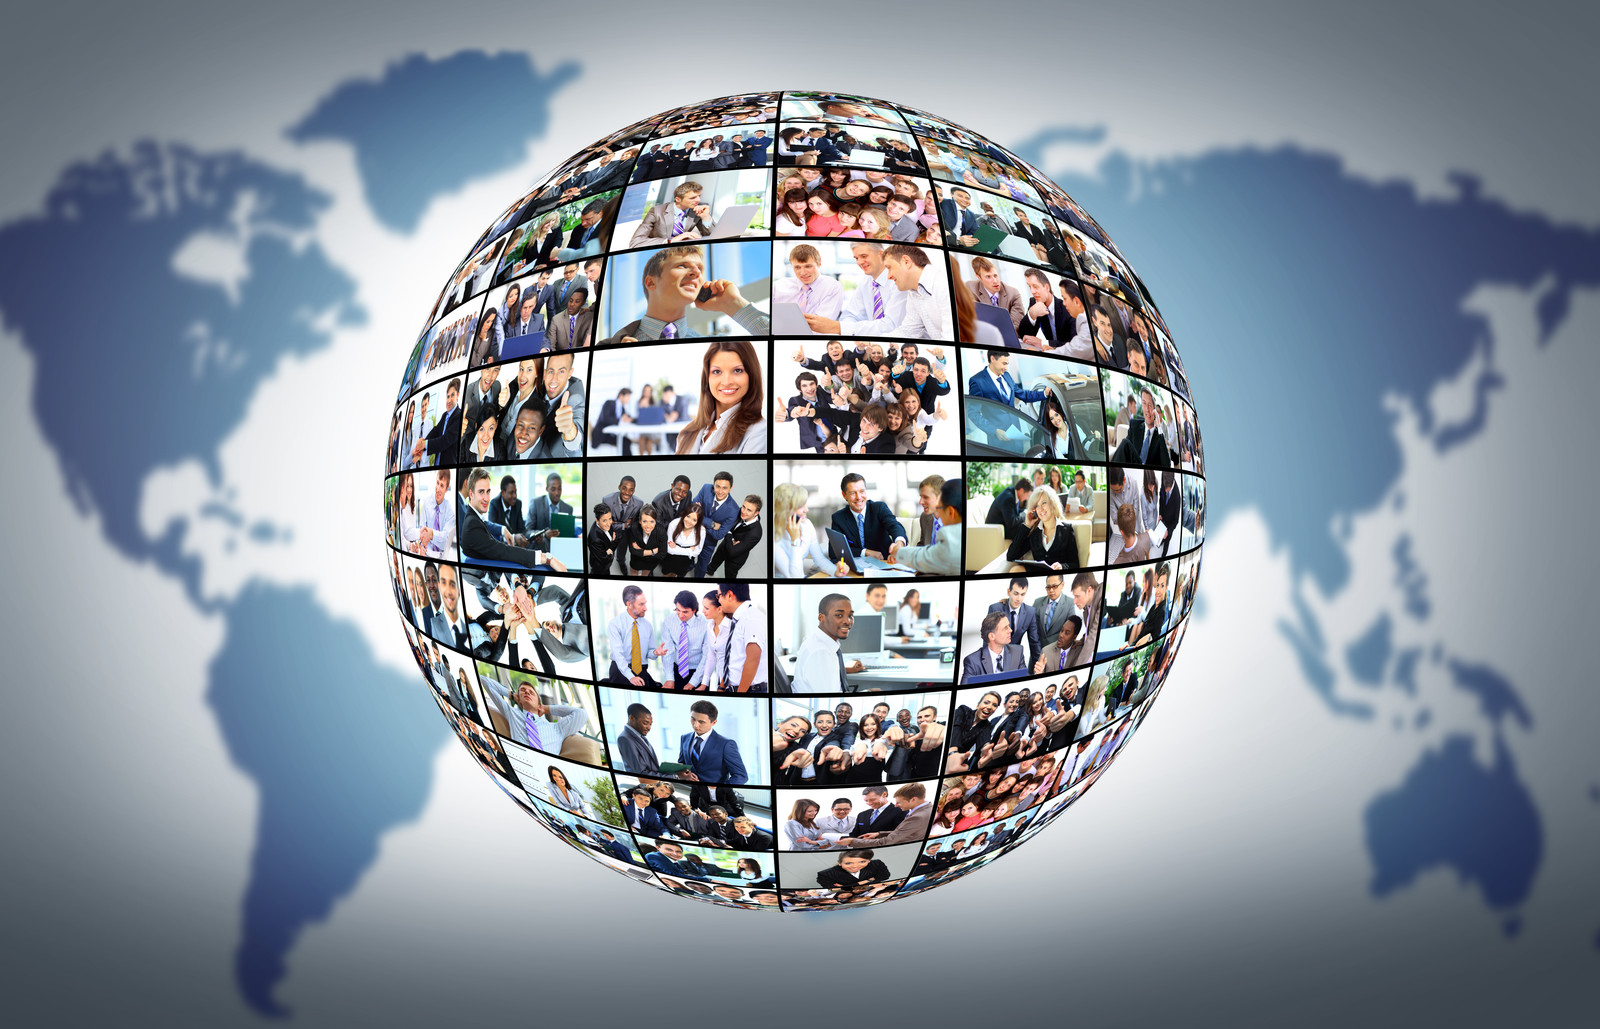 Selon Tony Robbins : mieux que l'entreprenariat – le marketing de réseau